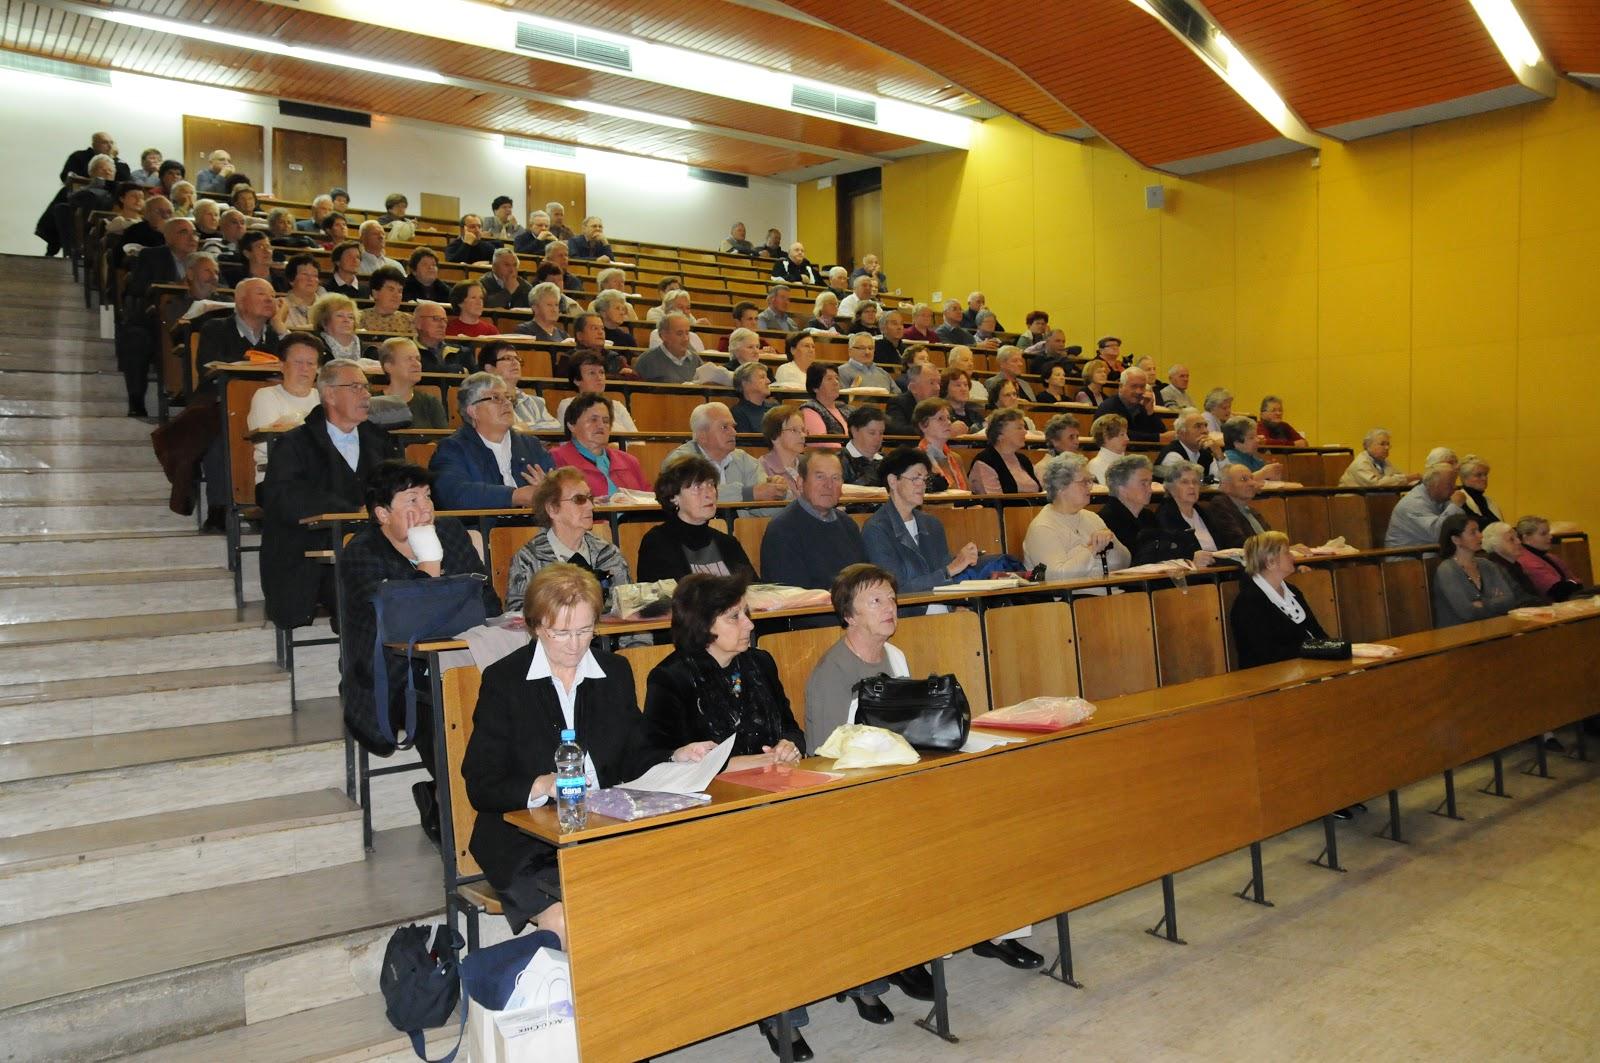 Predavanje, dr. Camlek - oktober 2011 - DSC_3870.JPG